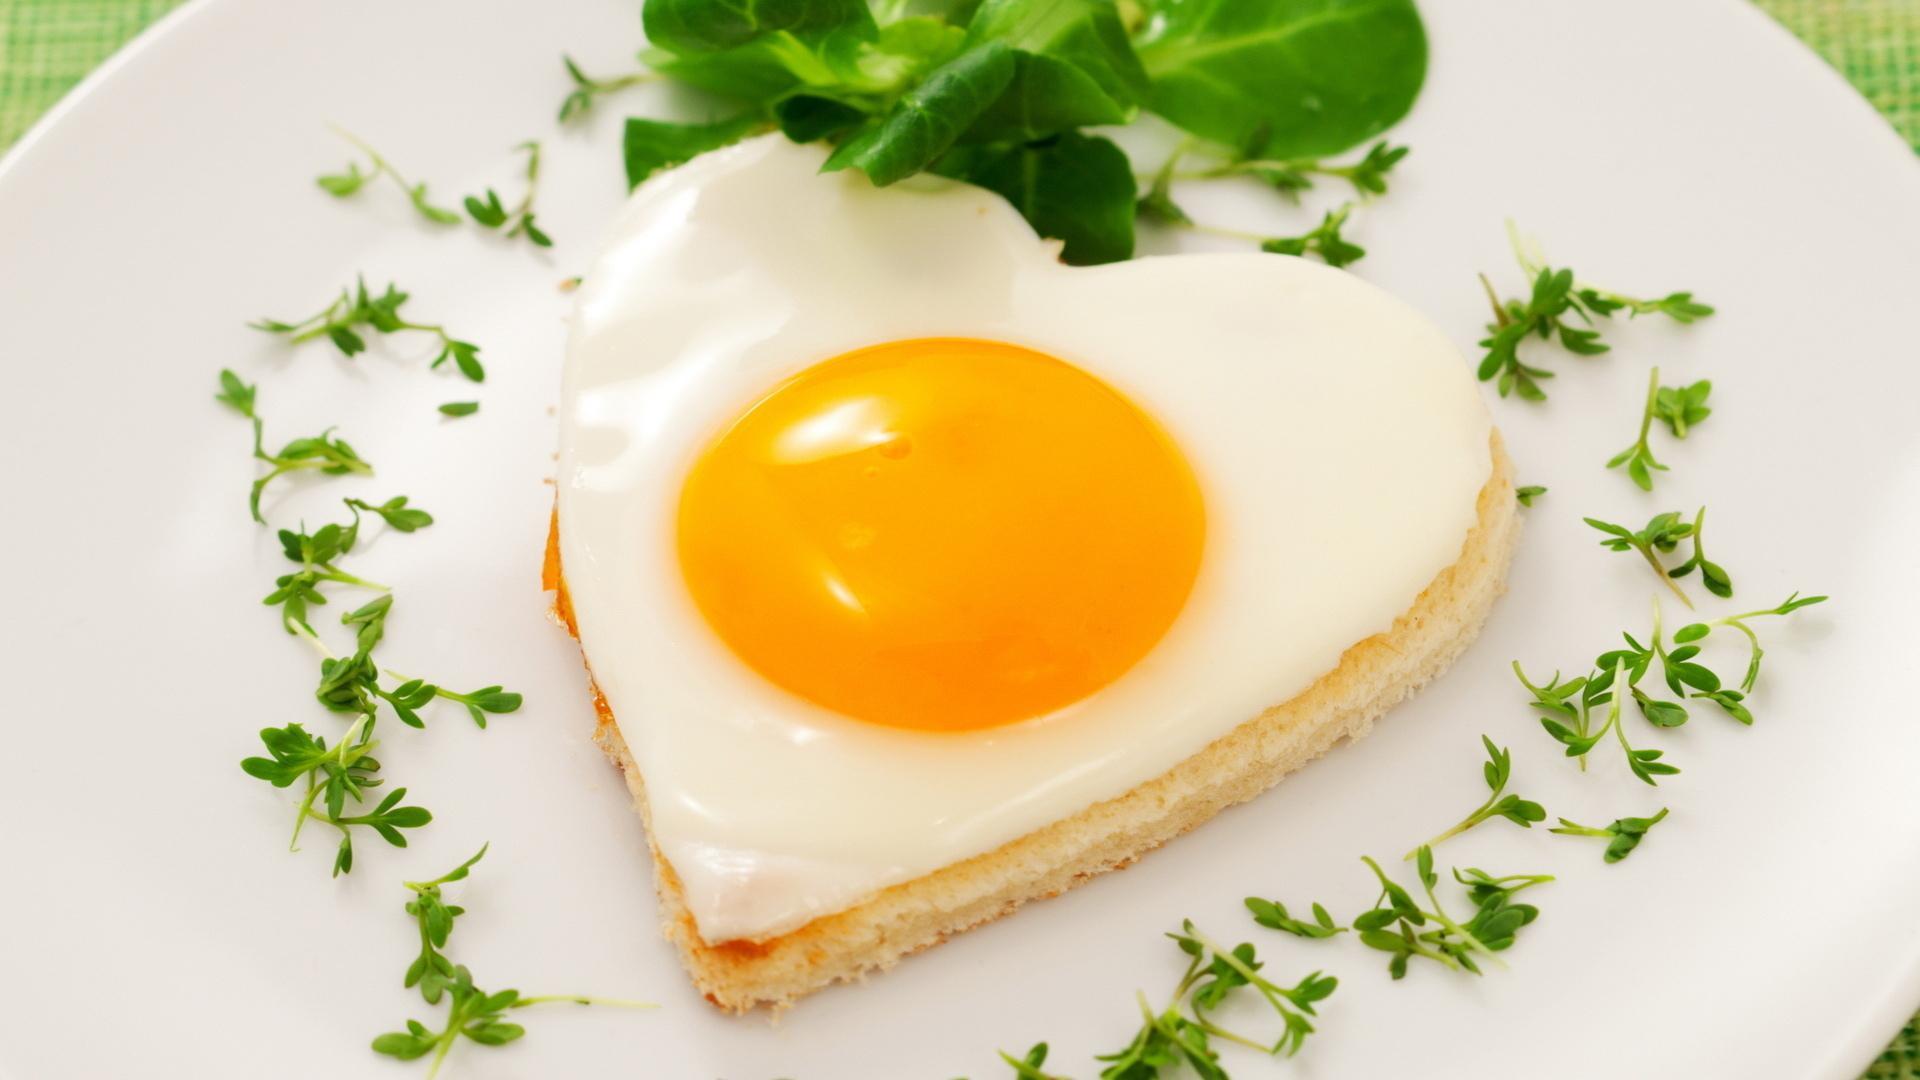 Яичная диета магги: меню на 4 недели